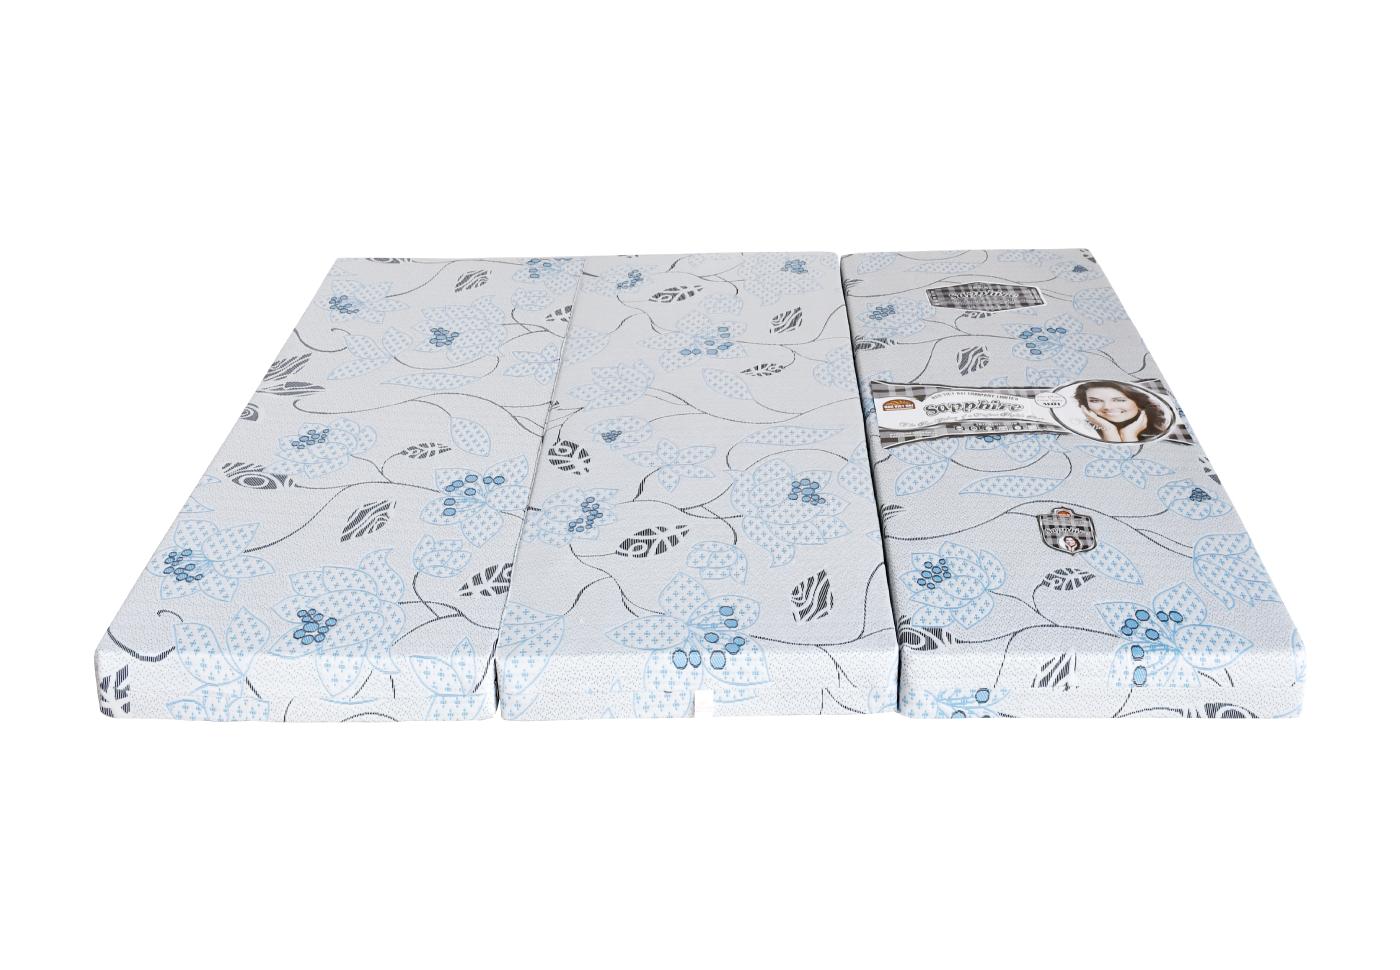 Nệm Gấp 3 PE Cao cấp SAPPHIRE Vải Xốp Gấm